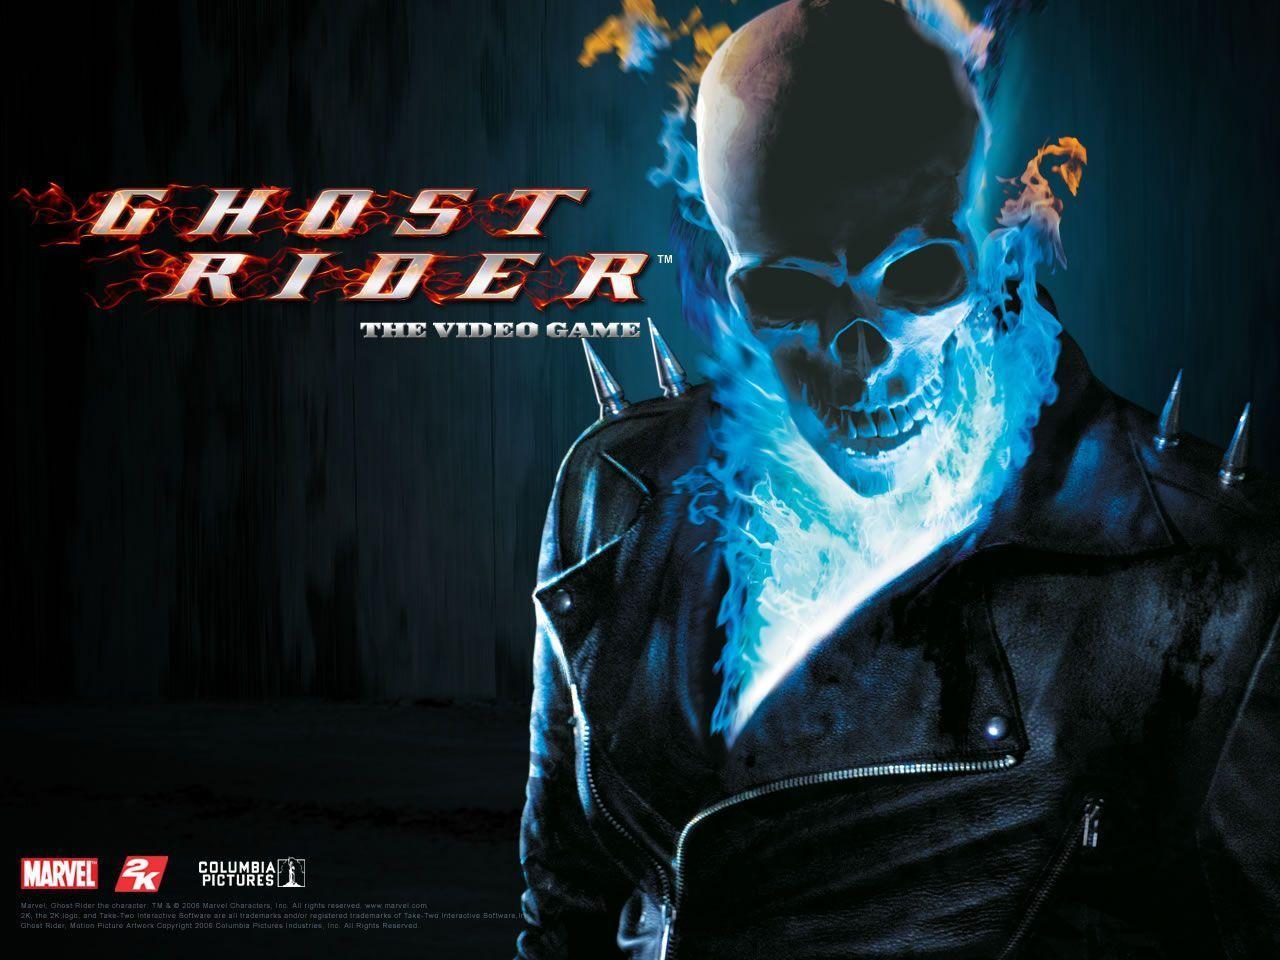 Ghost rider 3 3gp mobile movie download lostcoach.